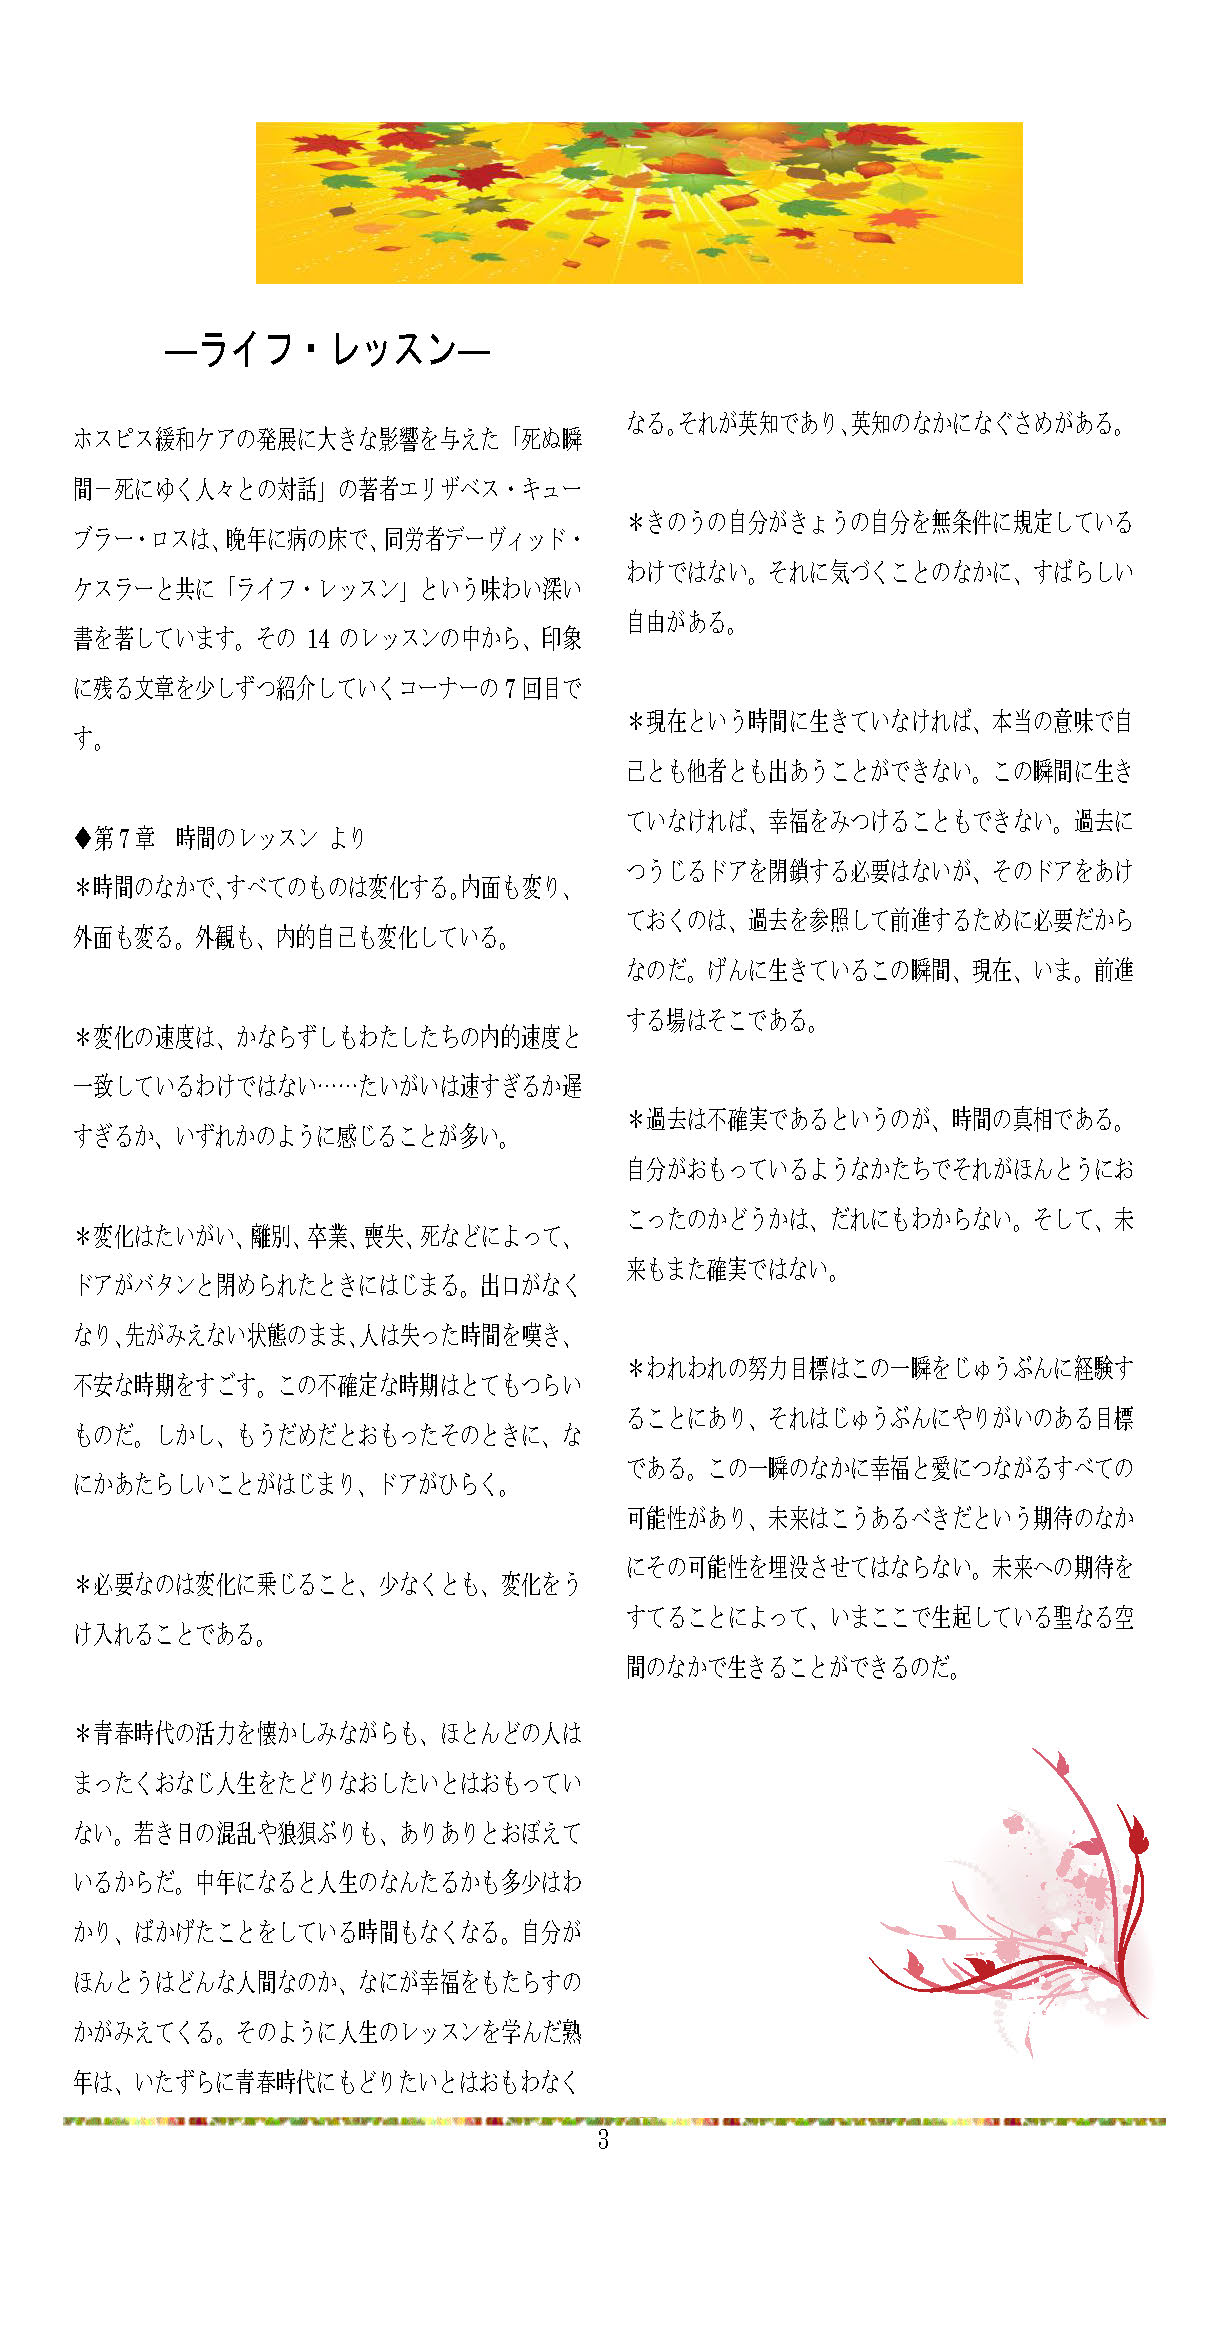 PCSGレター No.9(2012.9 第9号発行)_e0167087_13575727.jpg